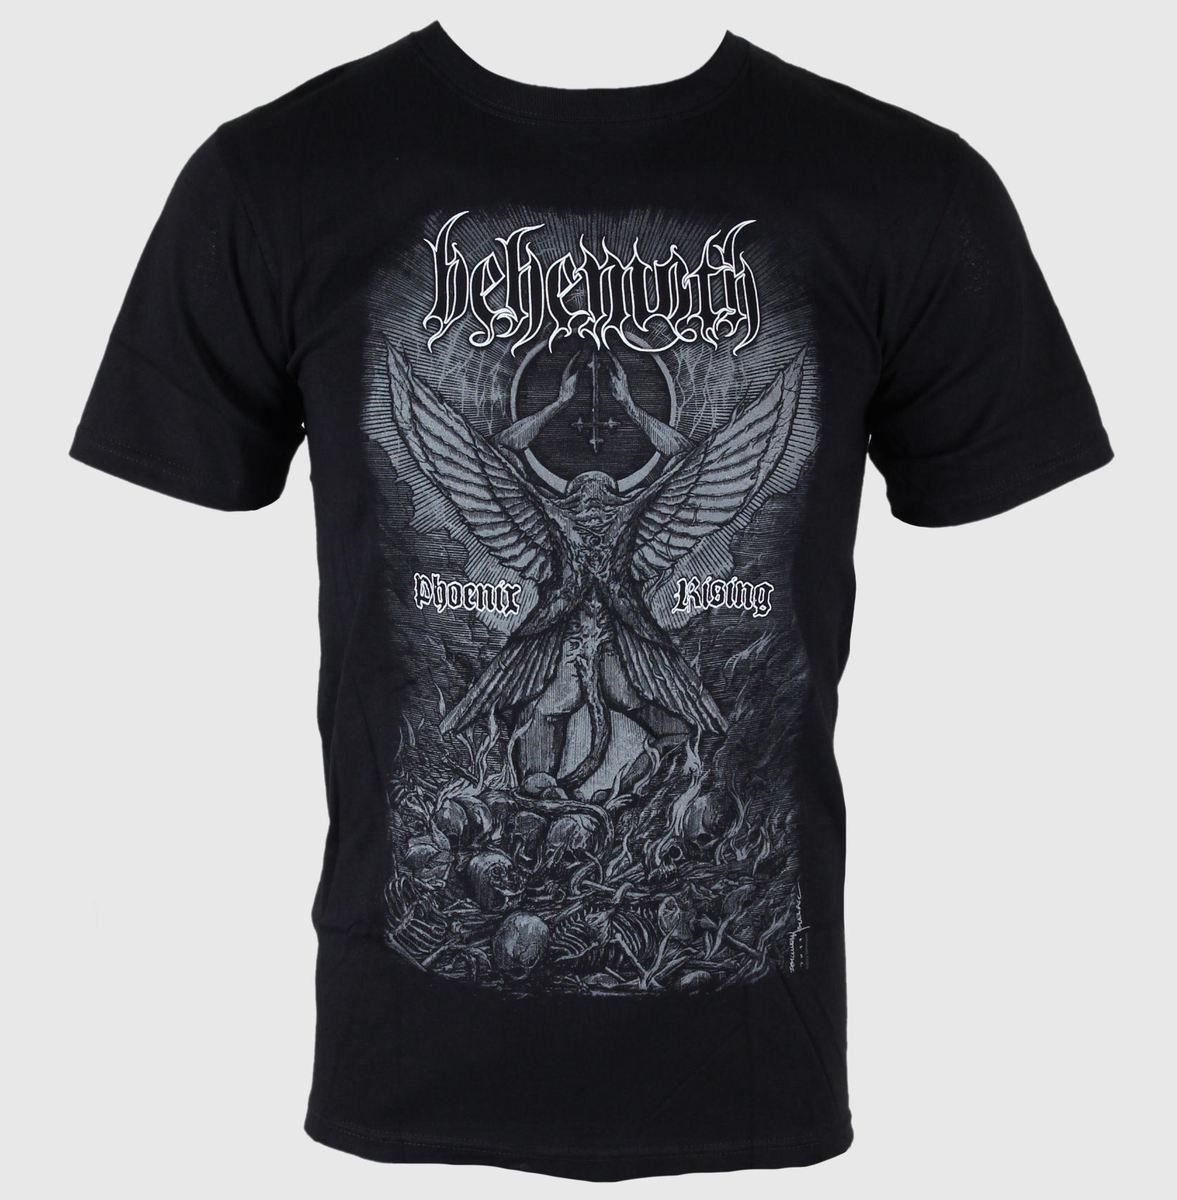 tričko pánské Behemoth - Phnix Ring - 2012 Tour - Blk - JSR - BEH159